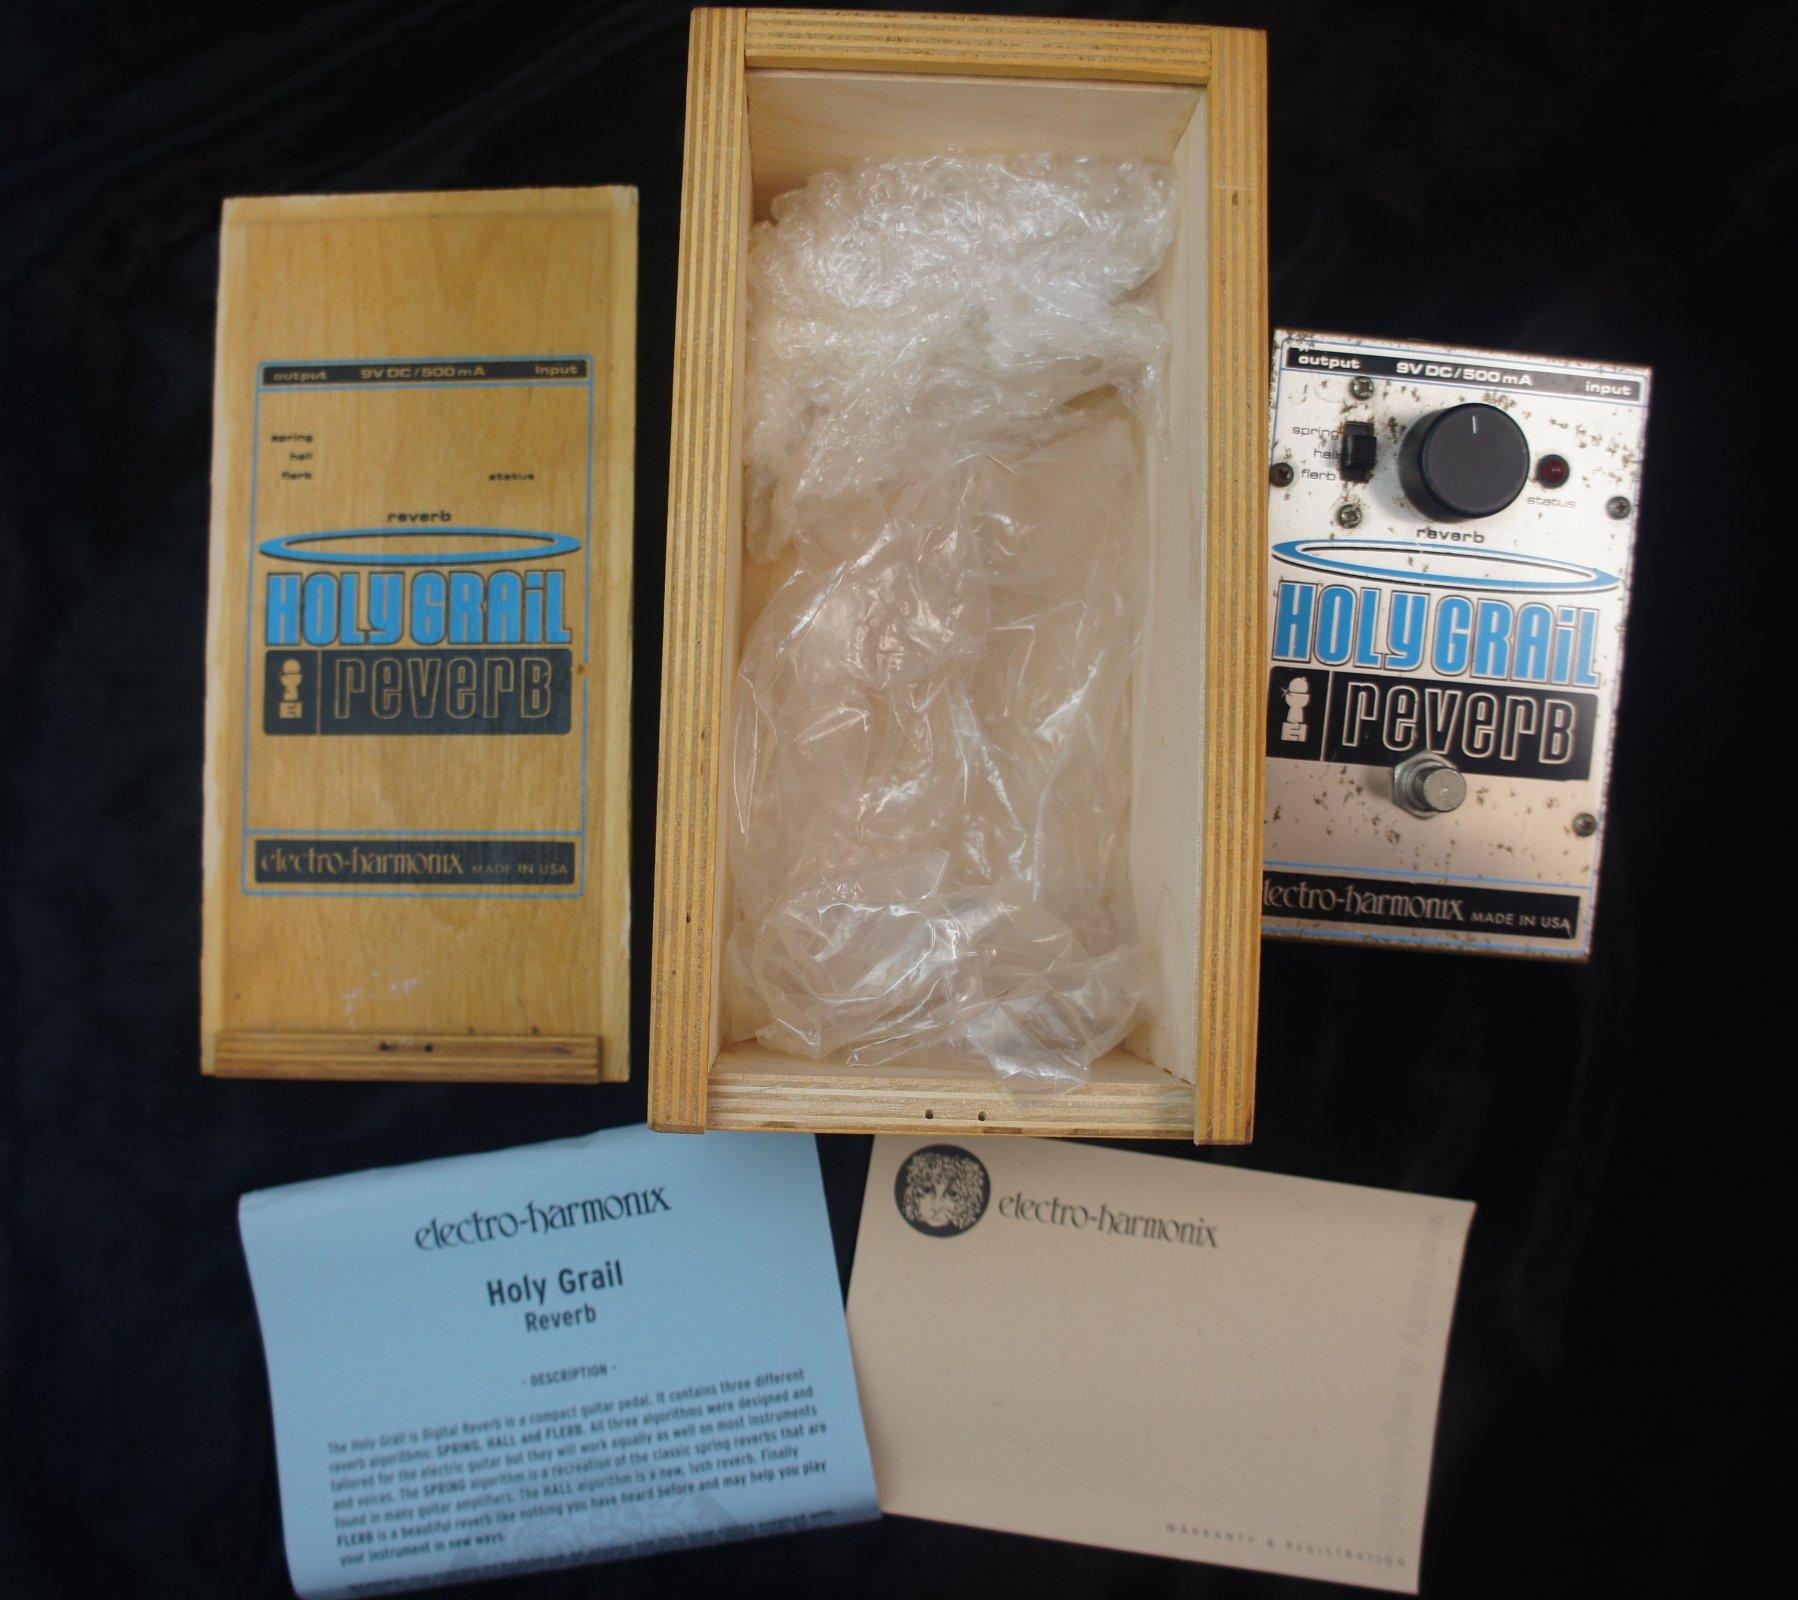 Electro Harmonix Holy Grail (used)